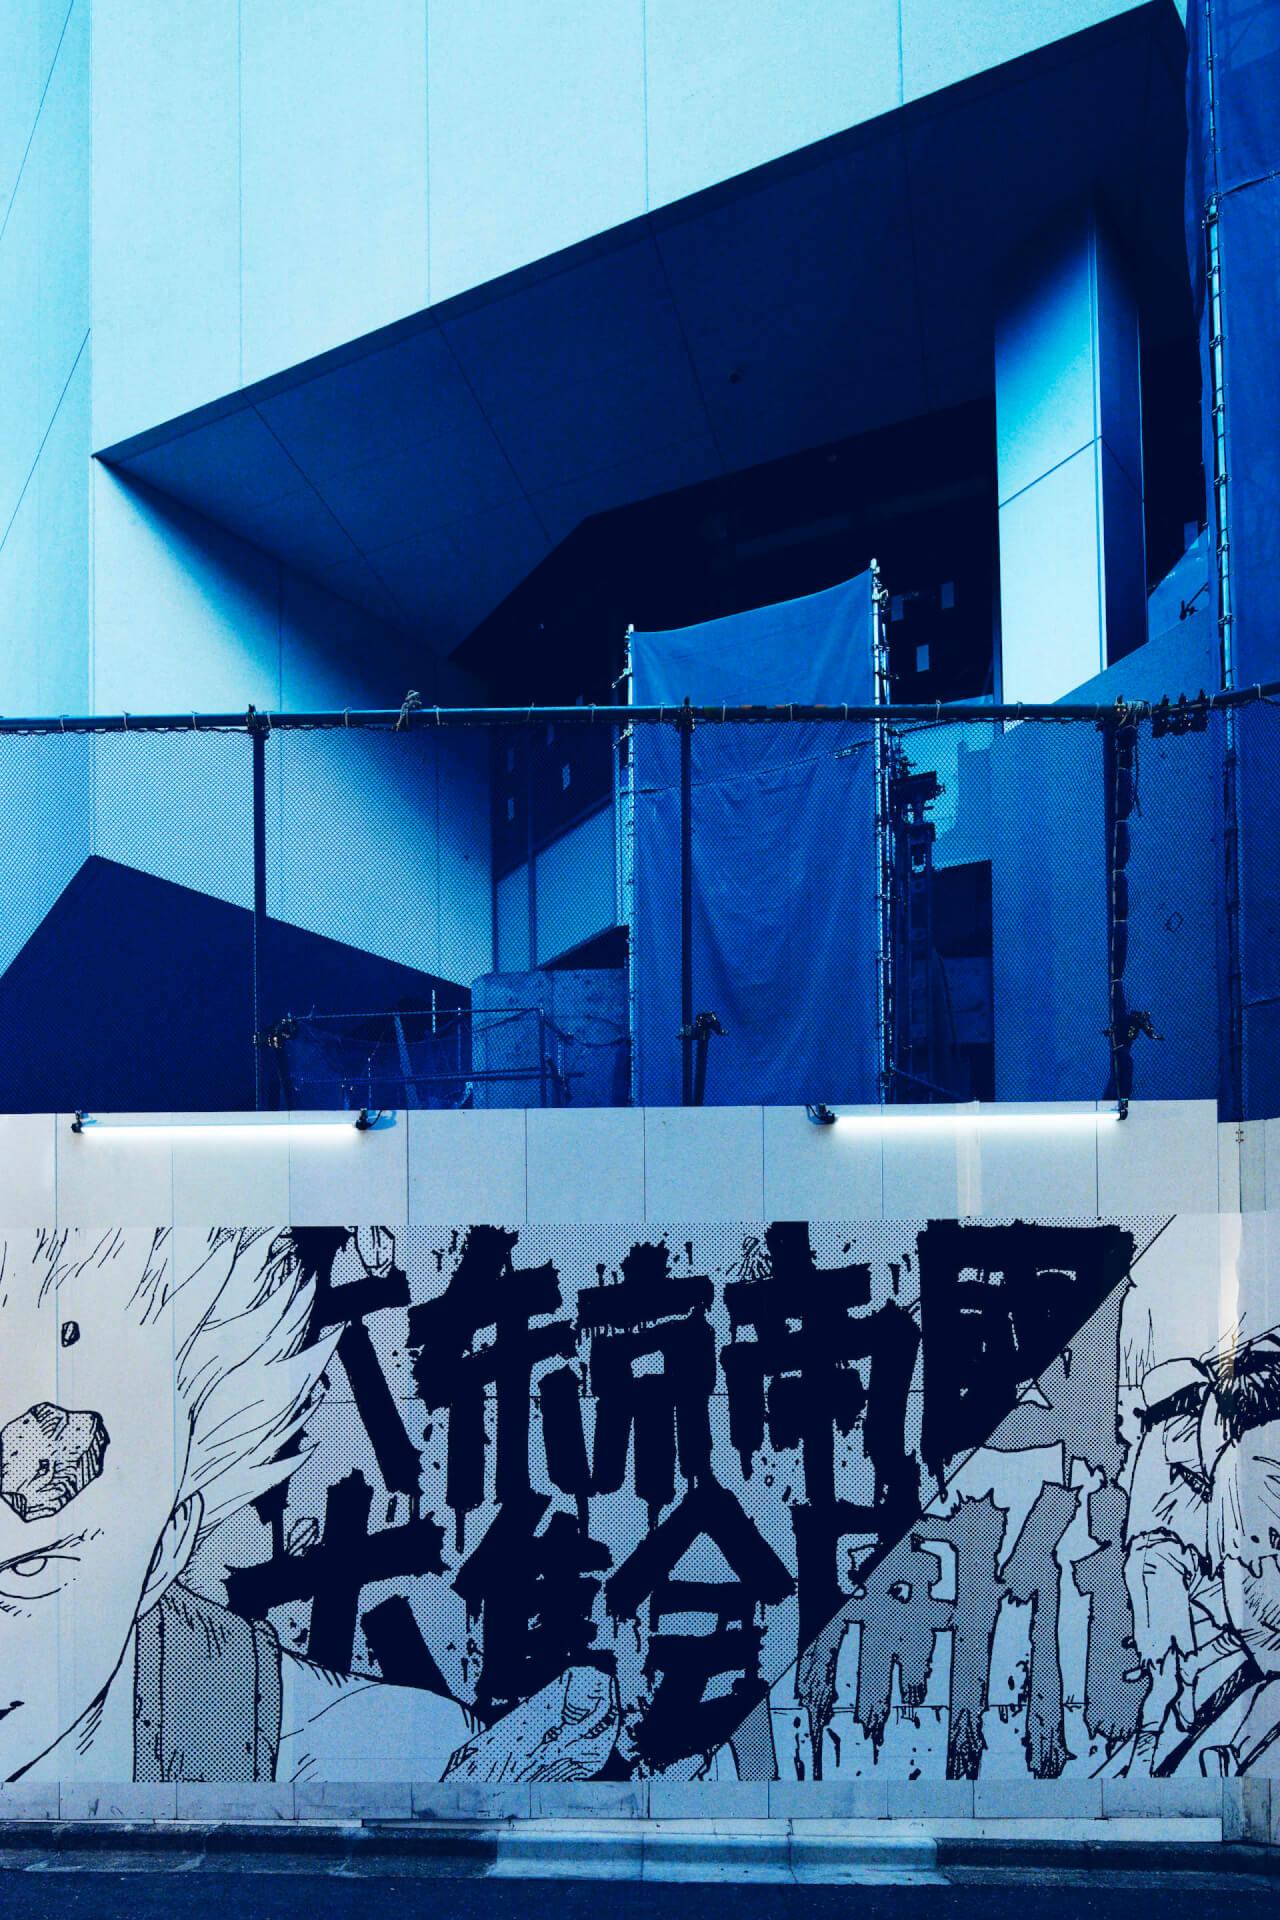 <AKIRA ART OF WALL>、PARCO MUSEUM TOKYO&GALLERY Xオープン記念エキシビジョンとして開催決定 art190919_akira_artofwall_4